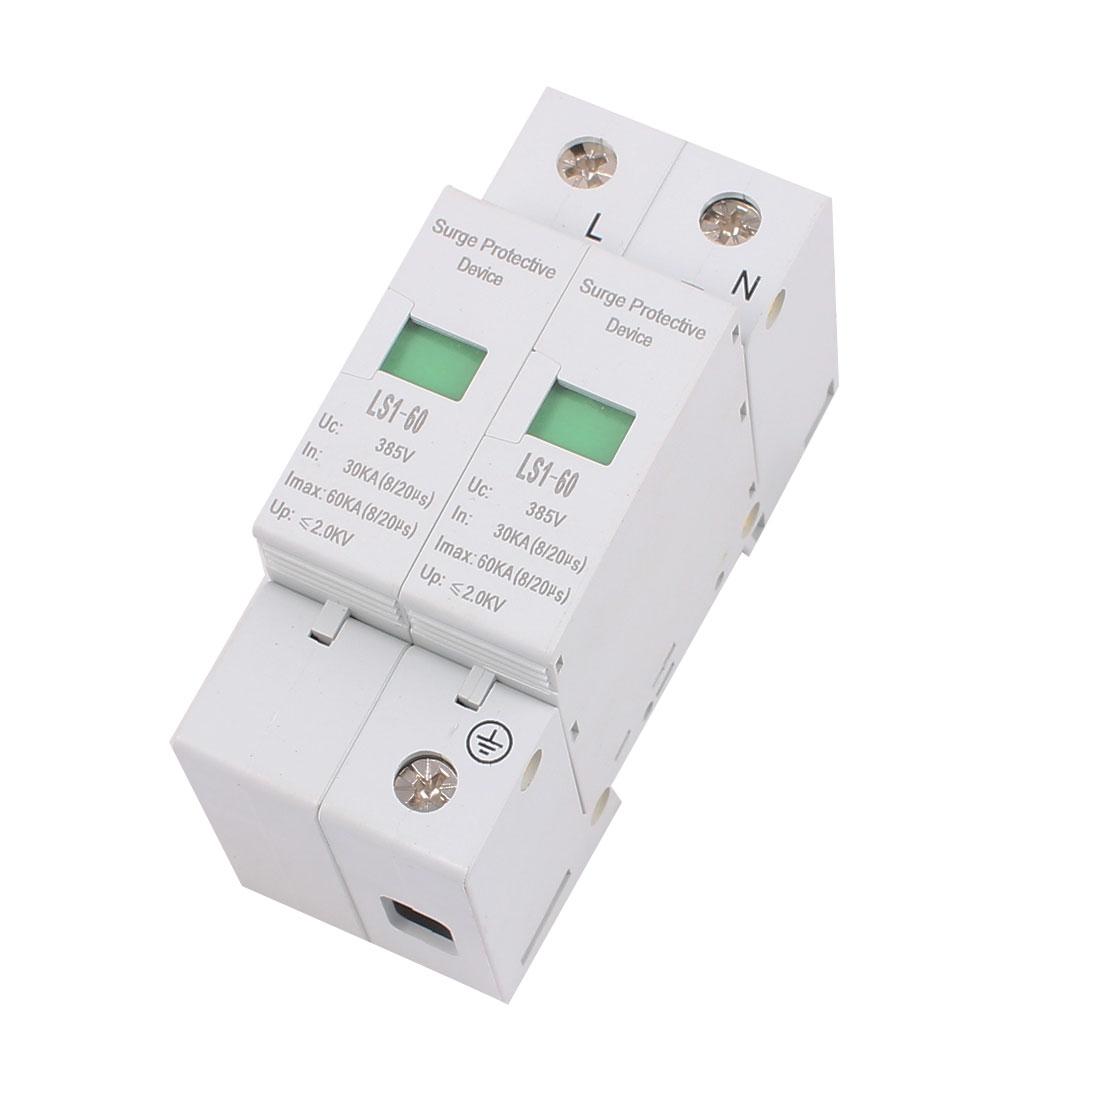 AC 385V 60KA Max Current 30KA In Single Phase Arrester Surge Protector Device